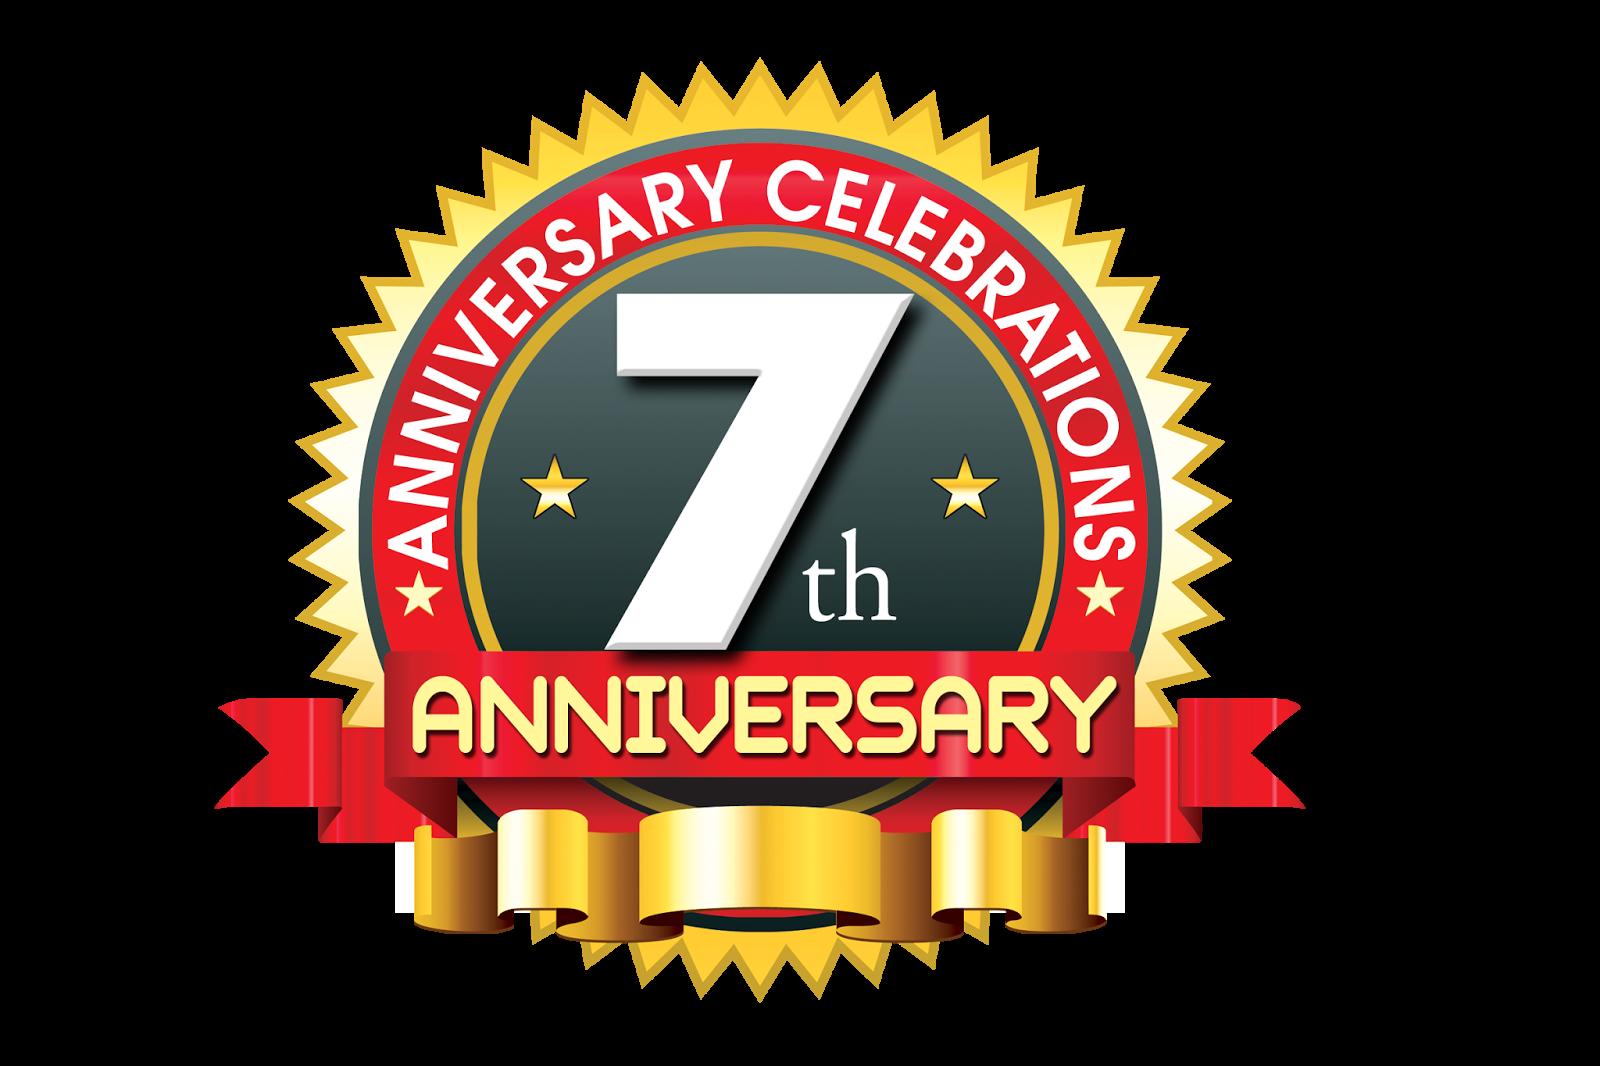 anniversary wishes company